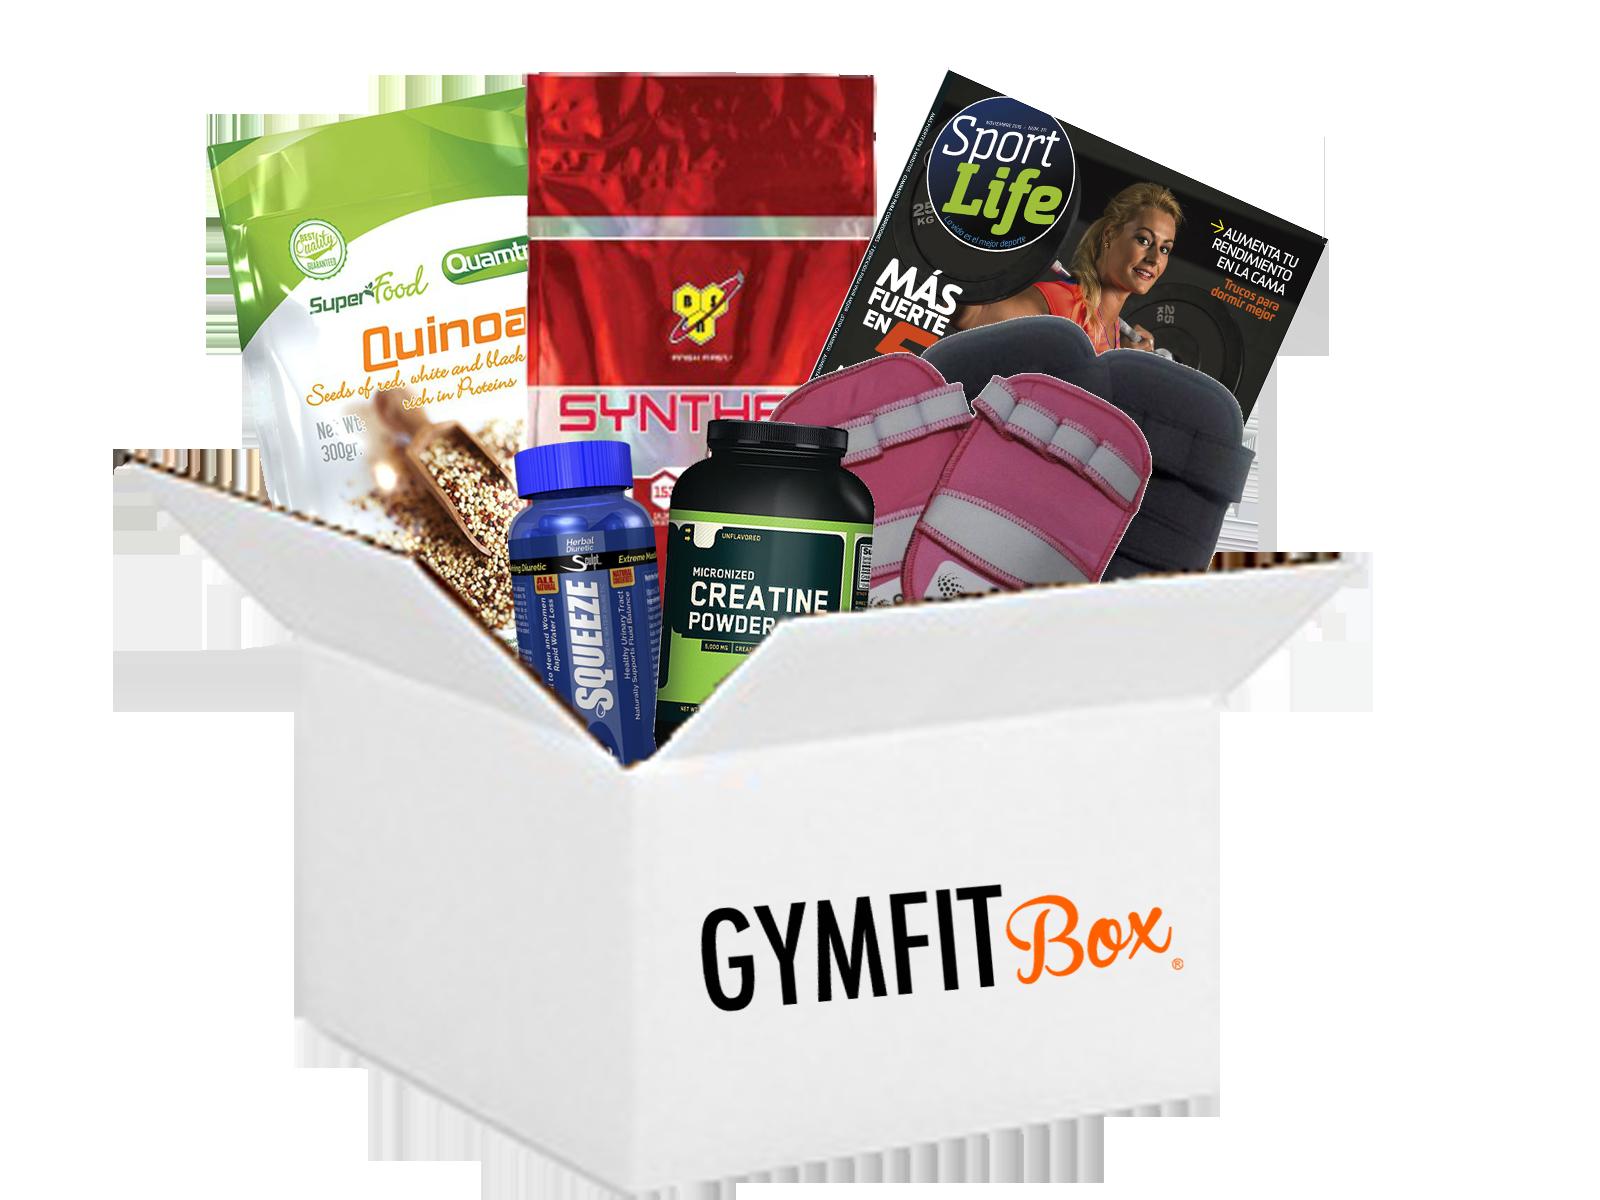 Gymfitbox Noviembre 2106